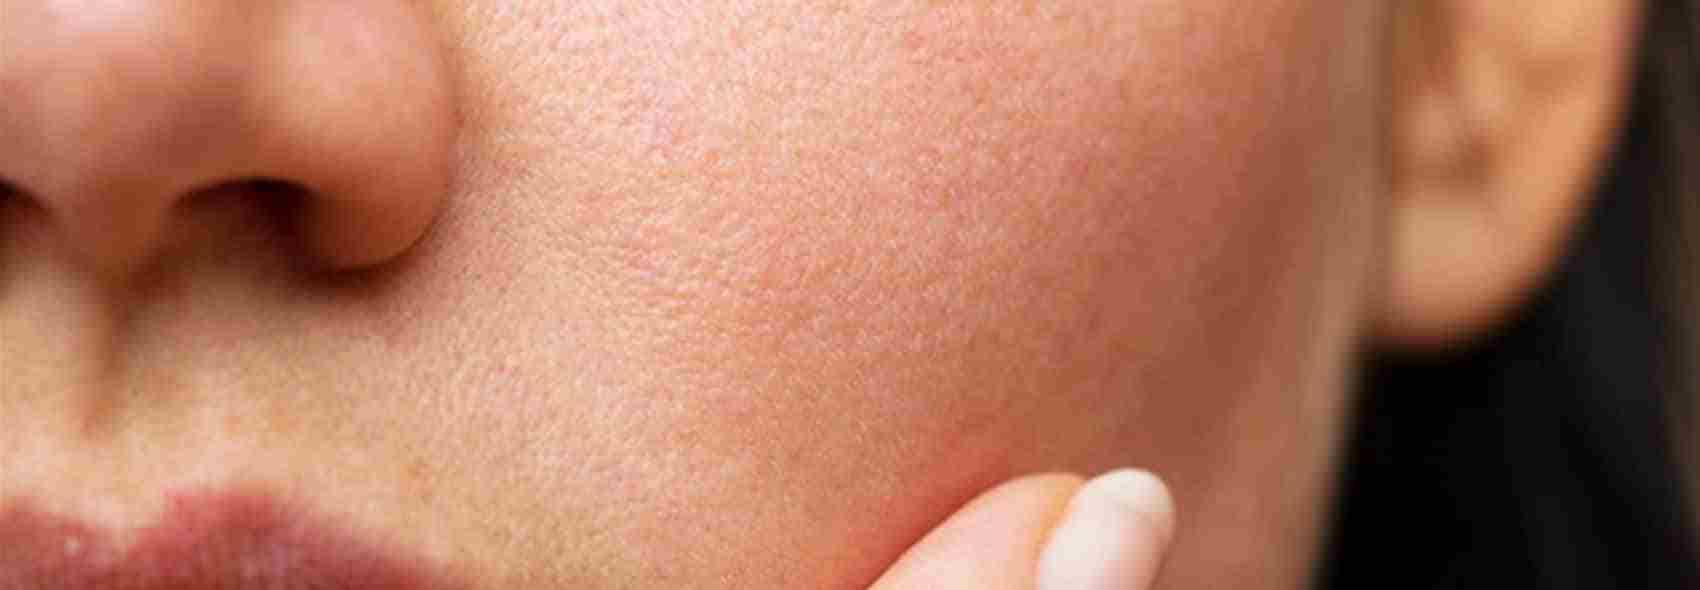 Pigmentation face skin